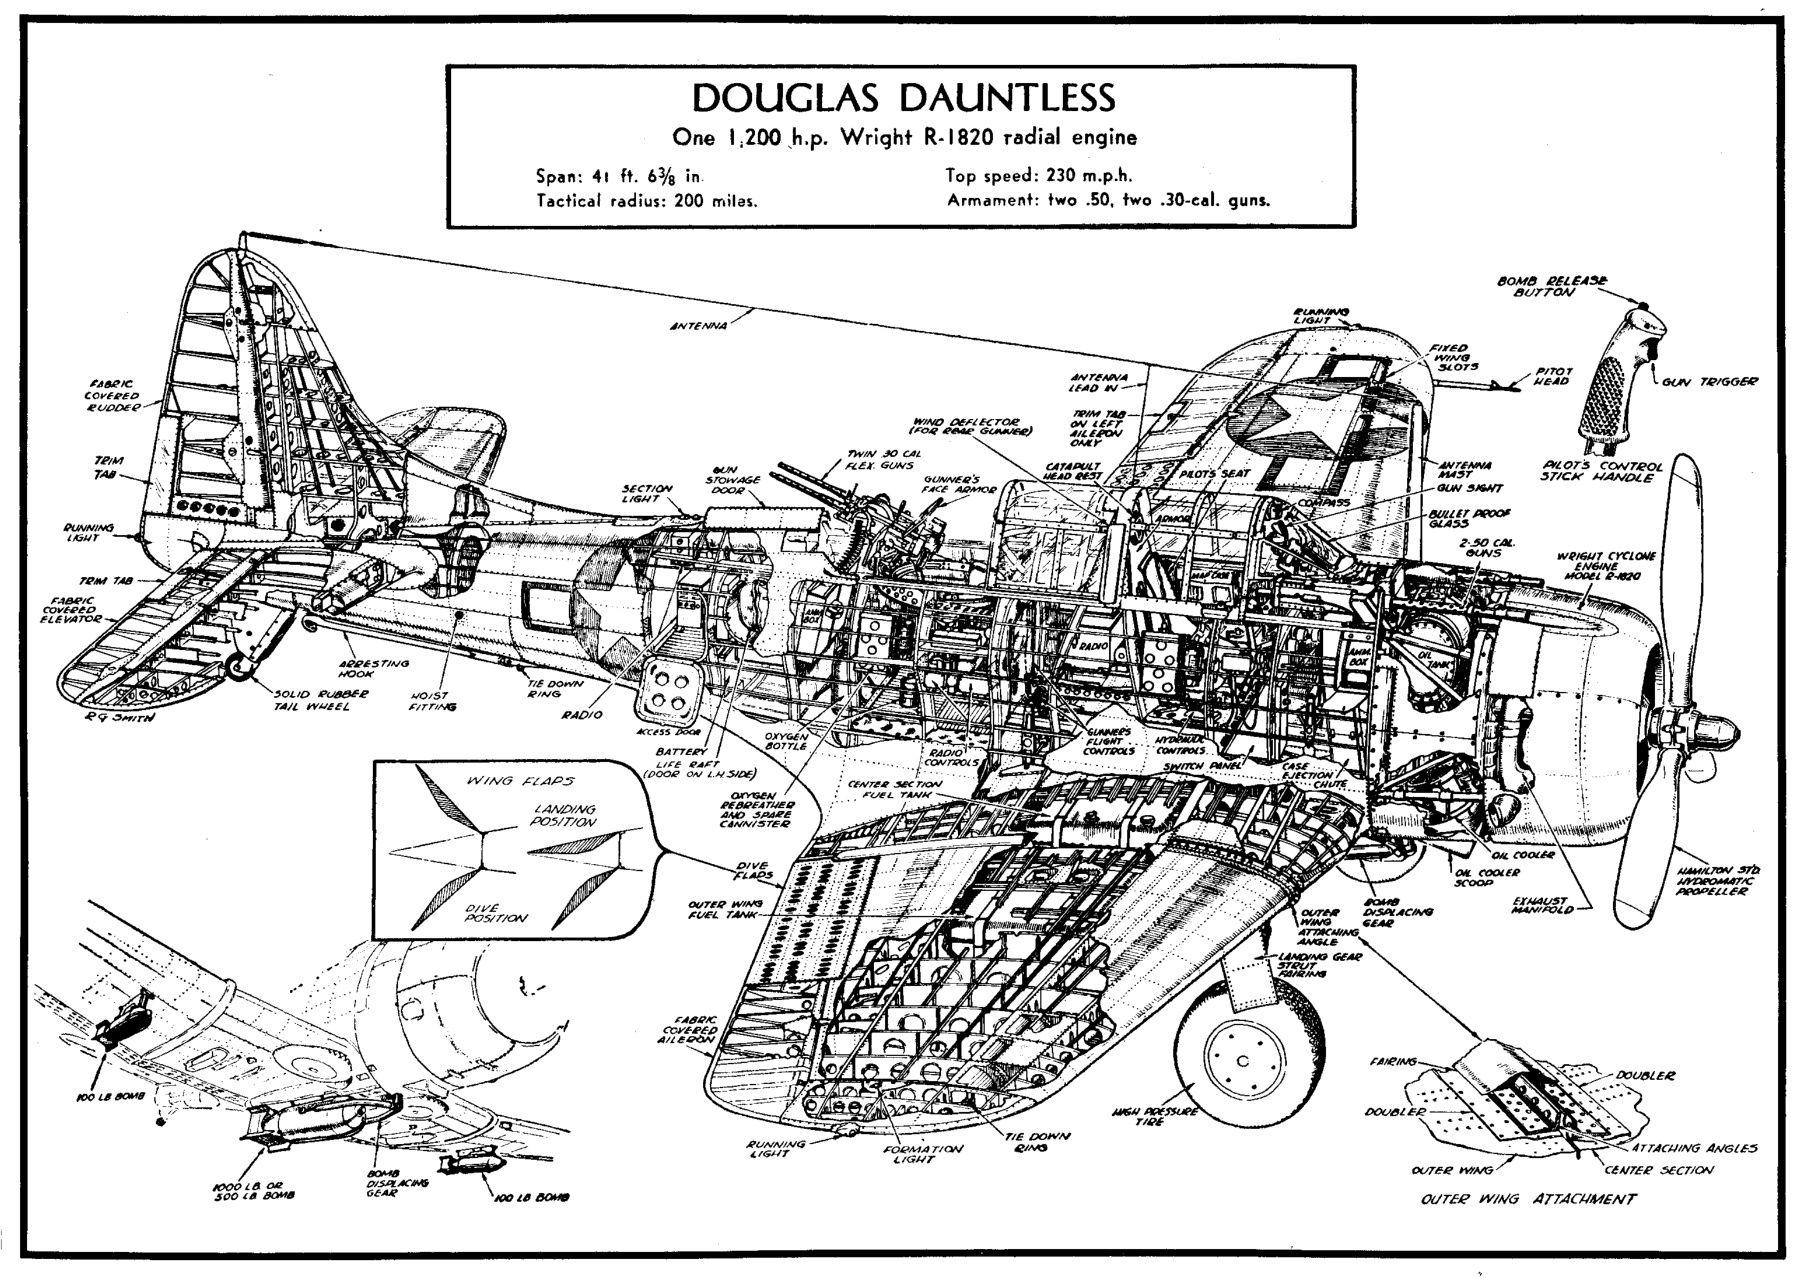 Douglas Dauntless Cutaway